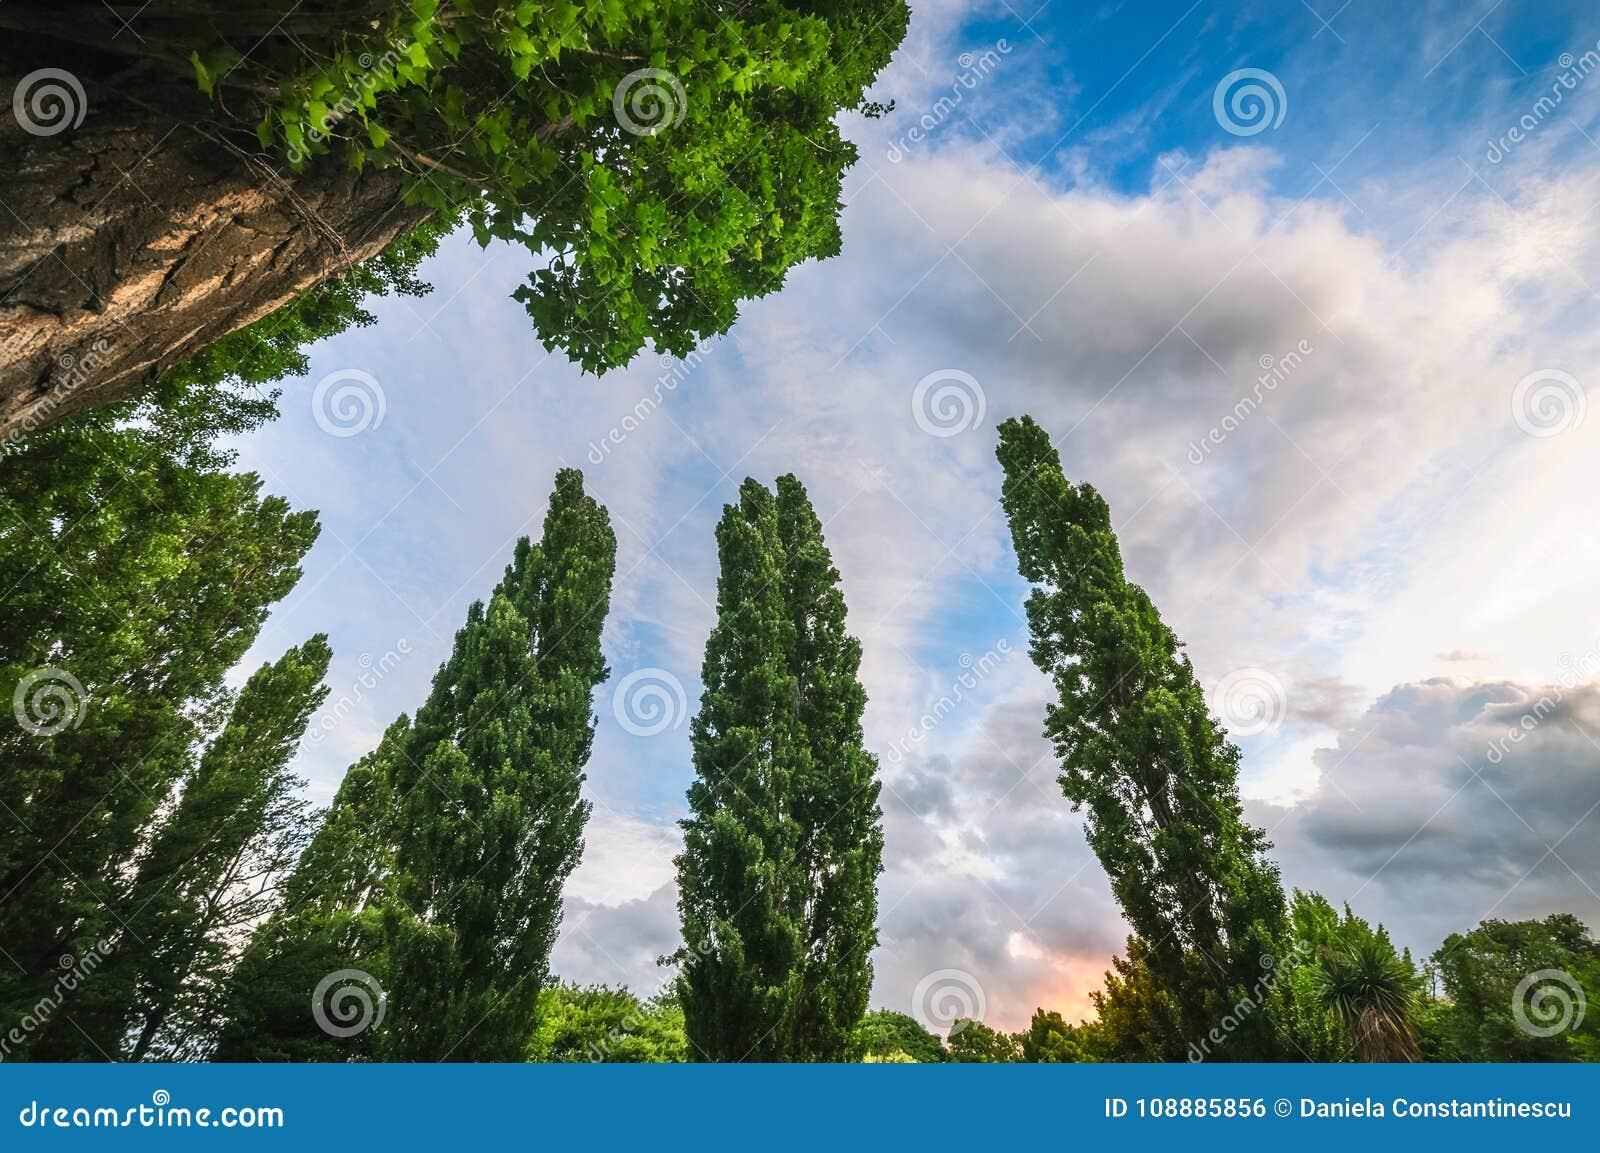 Poplar trees at sunset